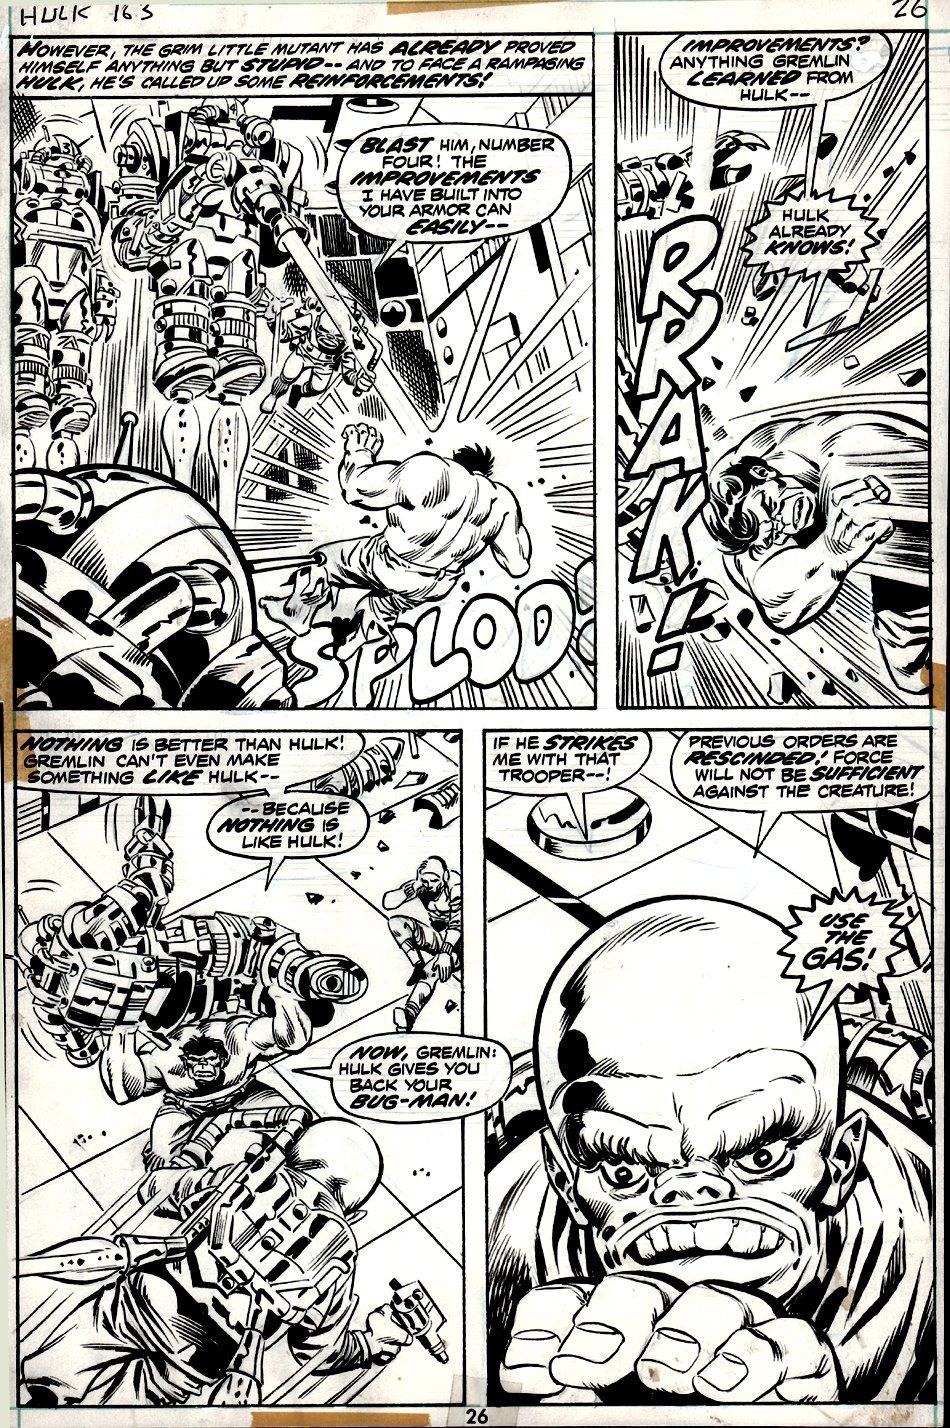 Incredible Hulk #163 p 26 (4 PANEL BATTLE PAGE!) 1972